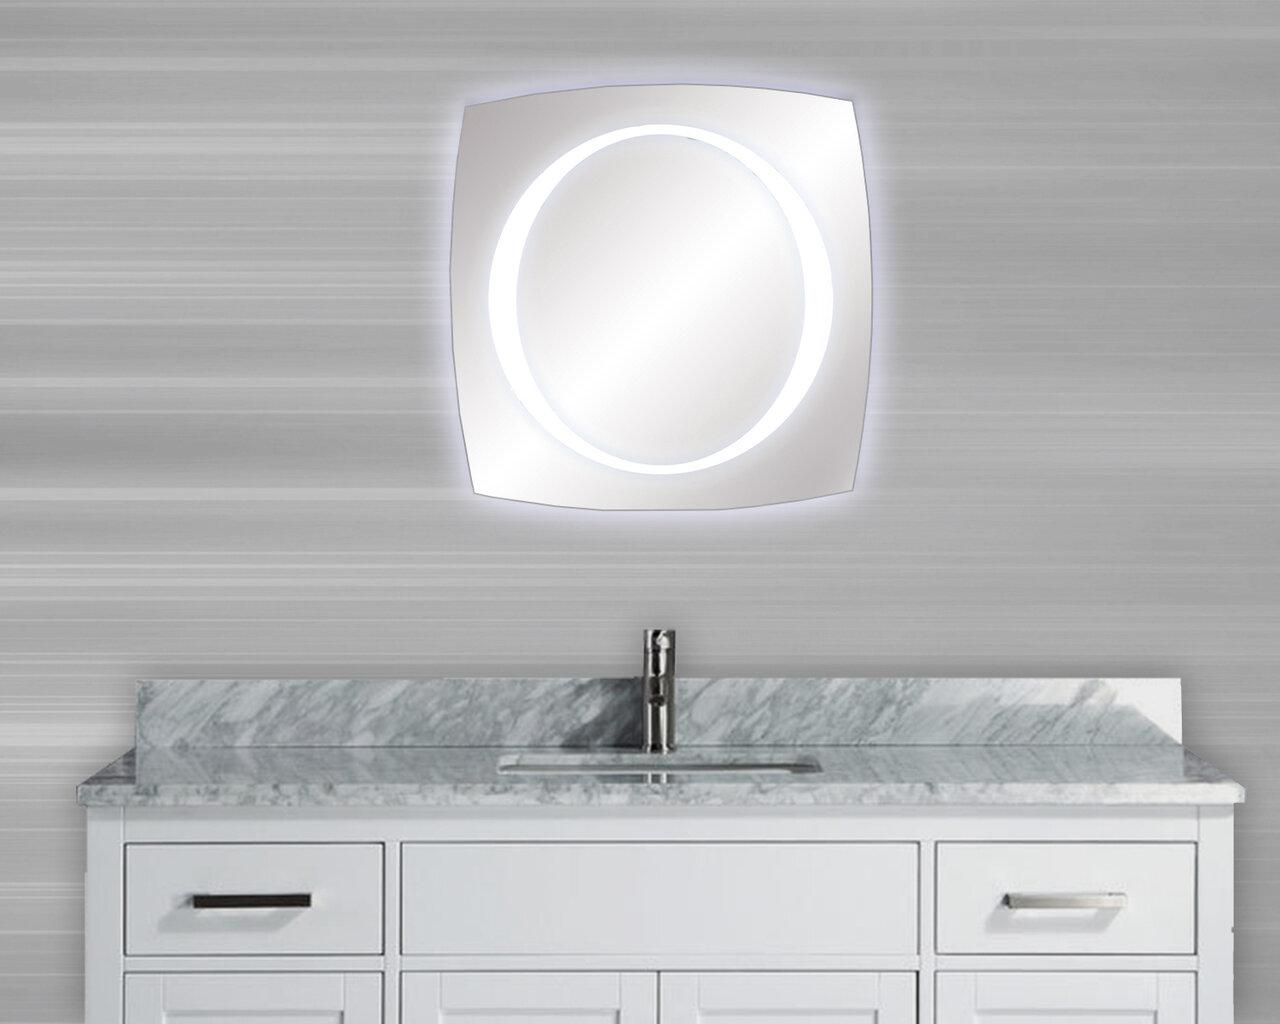 MTDVanities Vadara Halo LED Illuminated Bathroom/Vanity Mirror | Wayfair